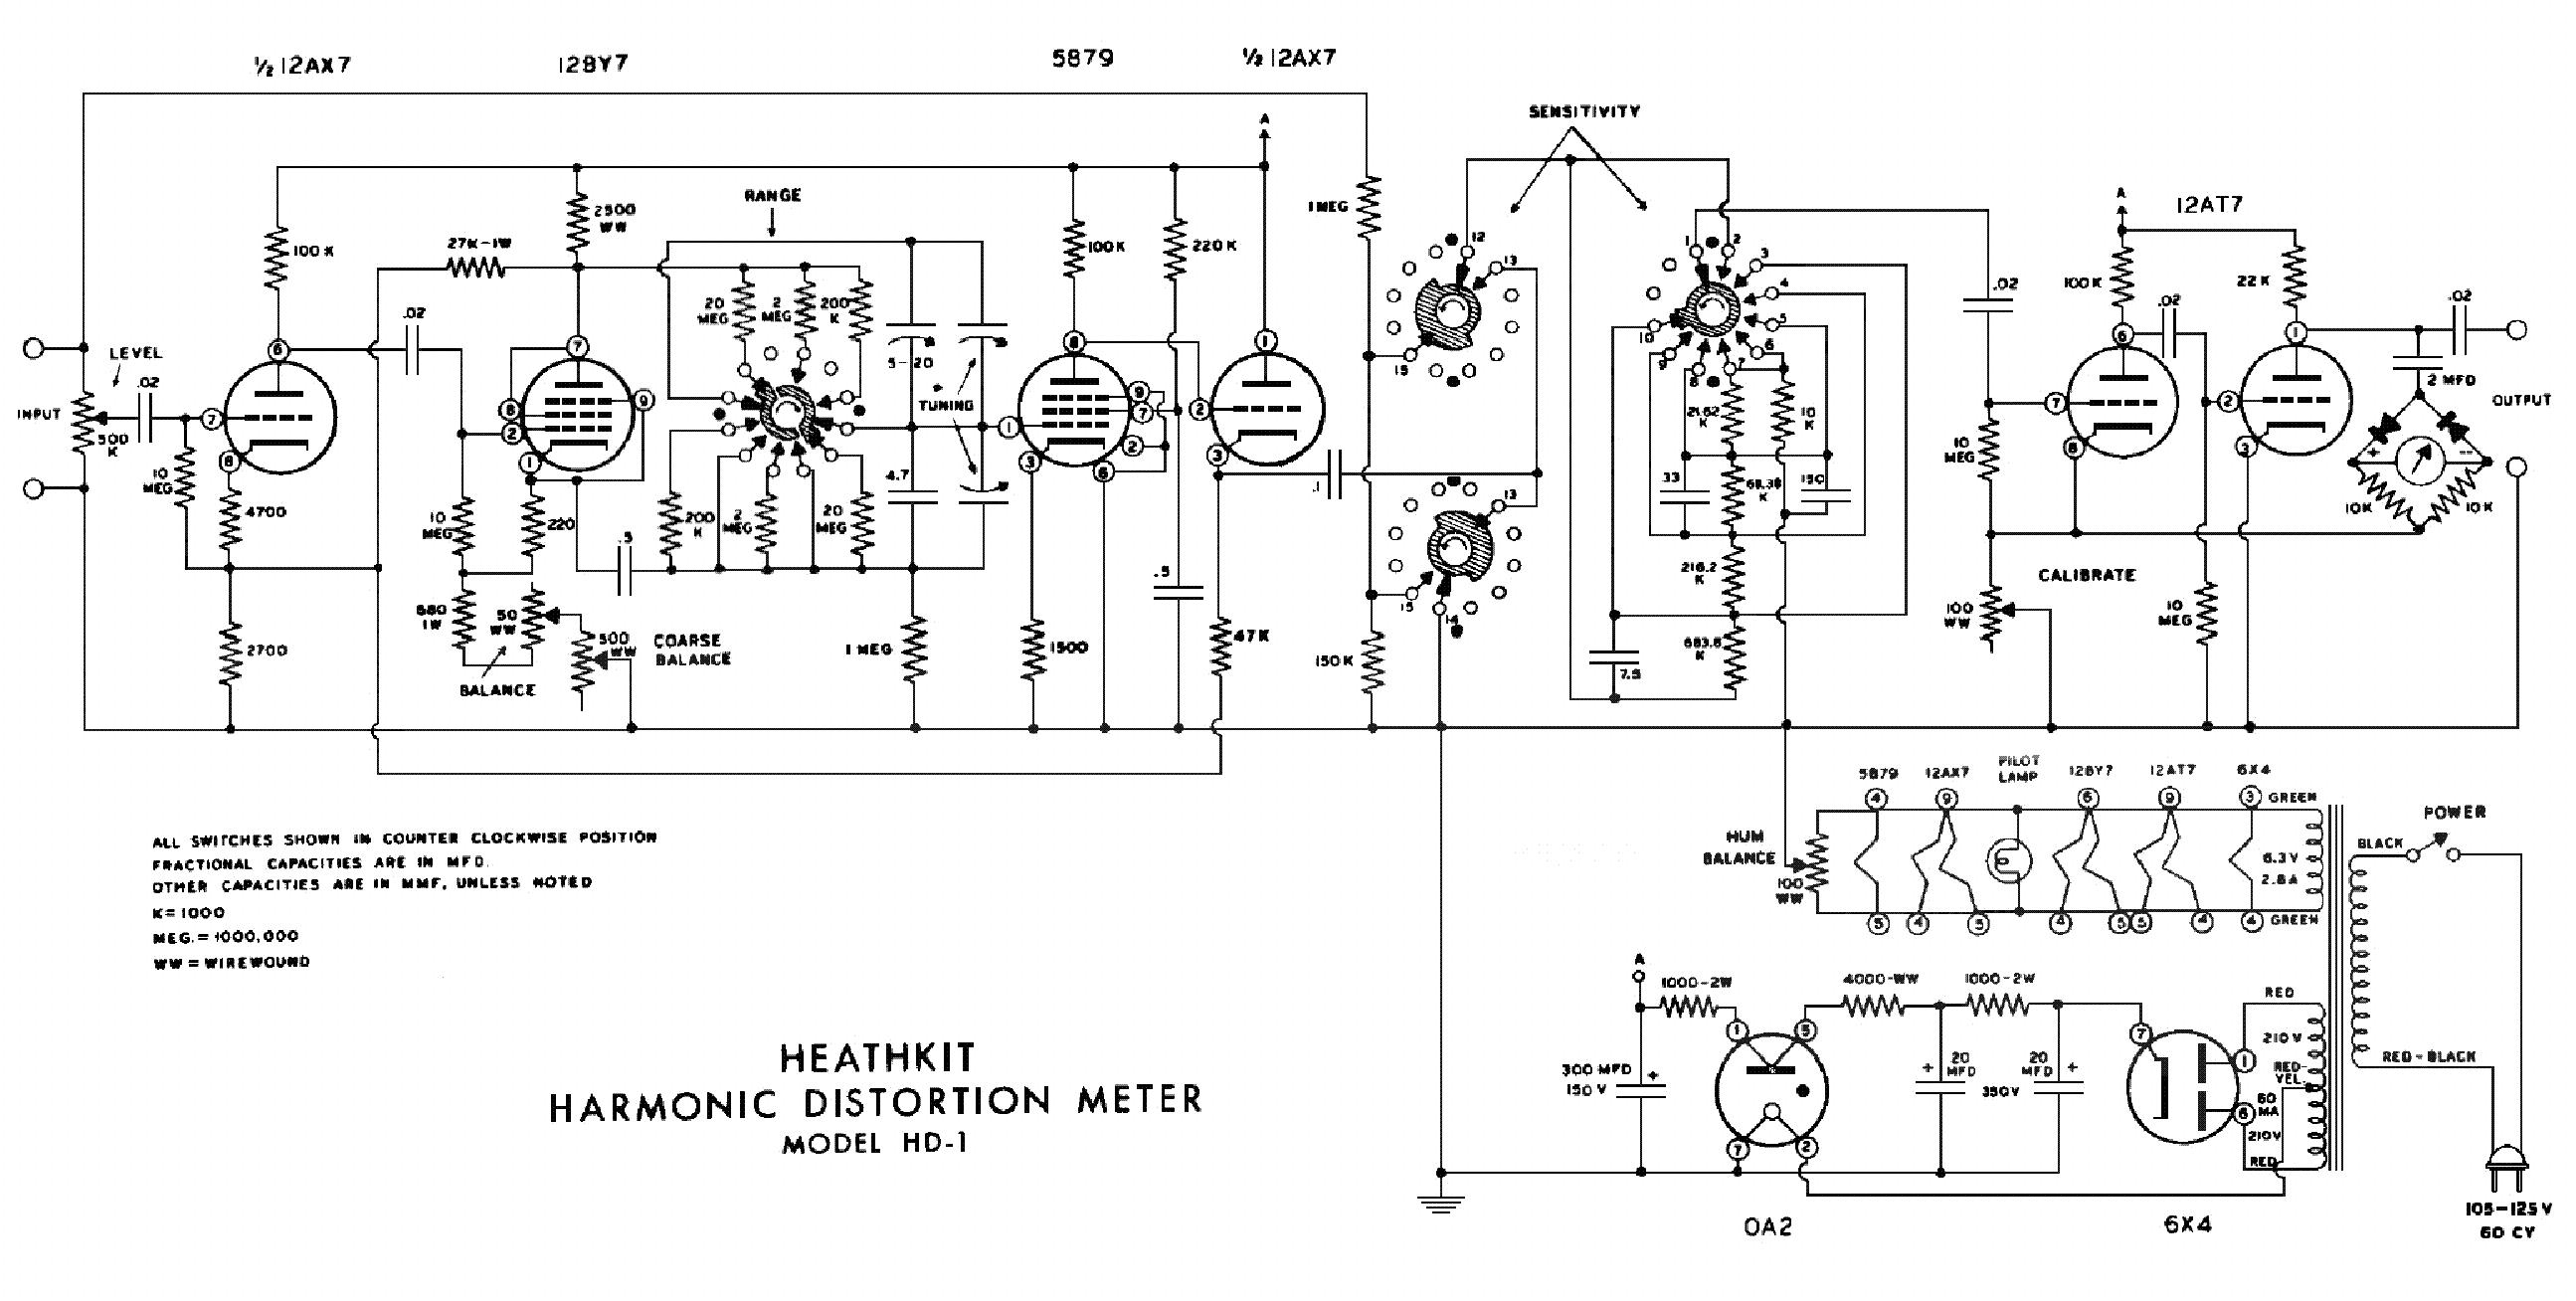 Harmonic Distortion Heathkit Hd 1 Harmonic Distortion Meter Sm Service Manual Free